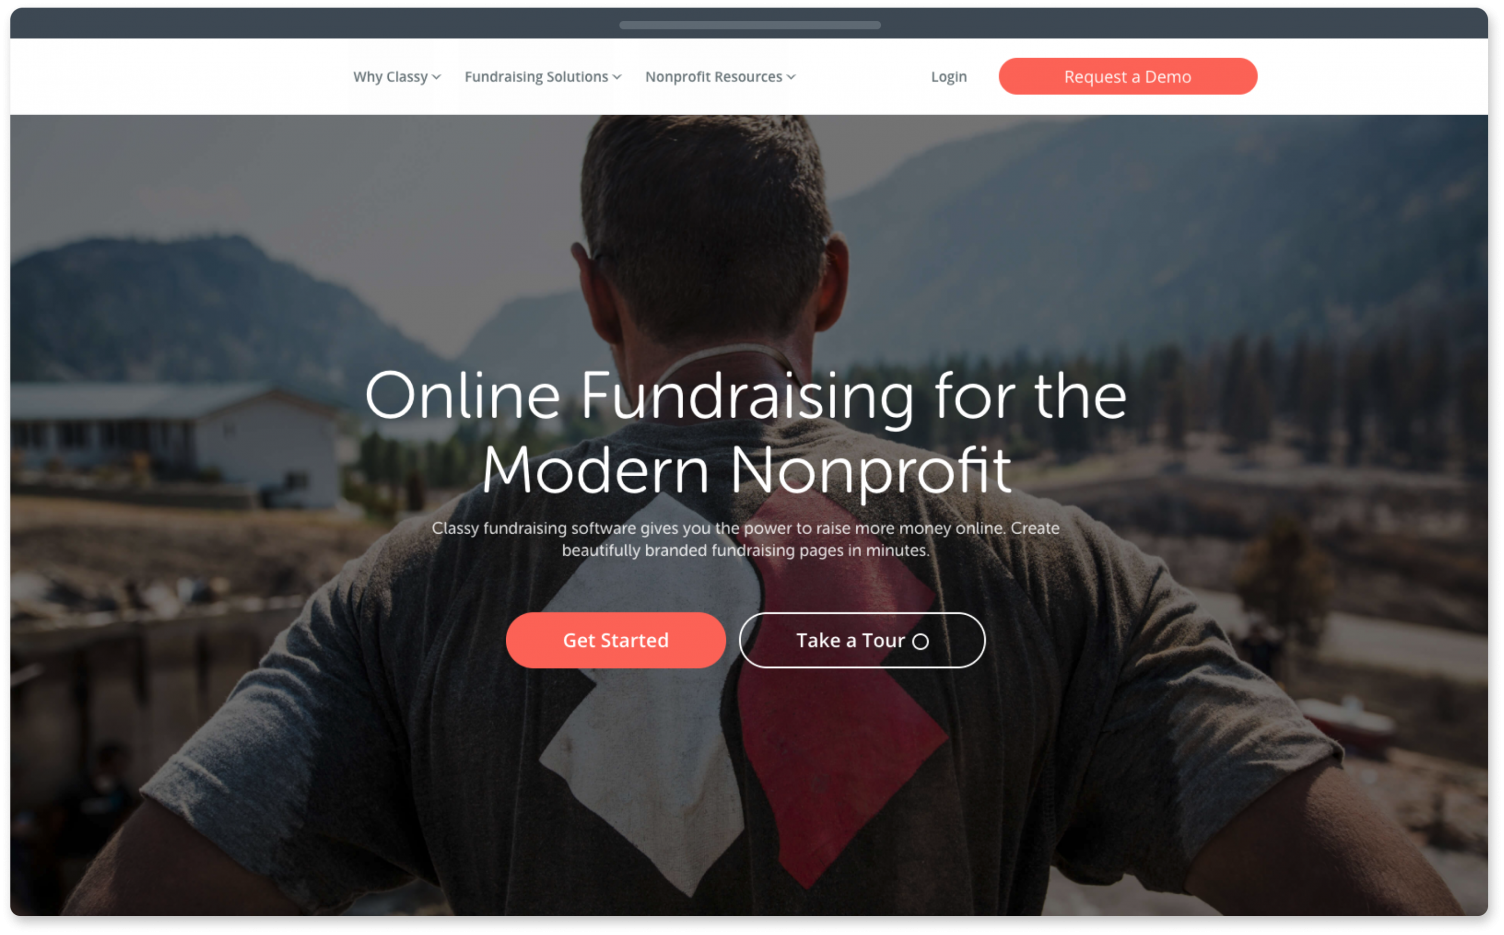 Classy fundraising website for nonprofits.